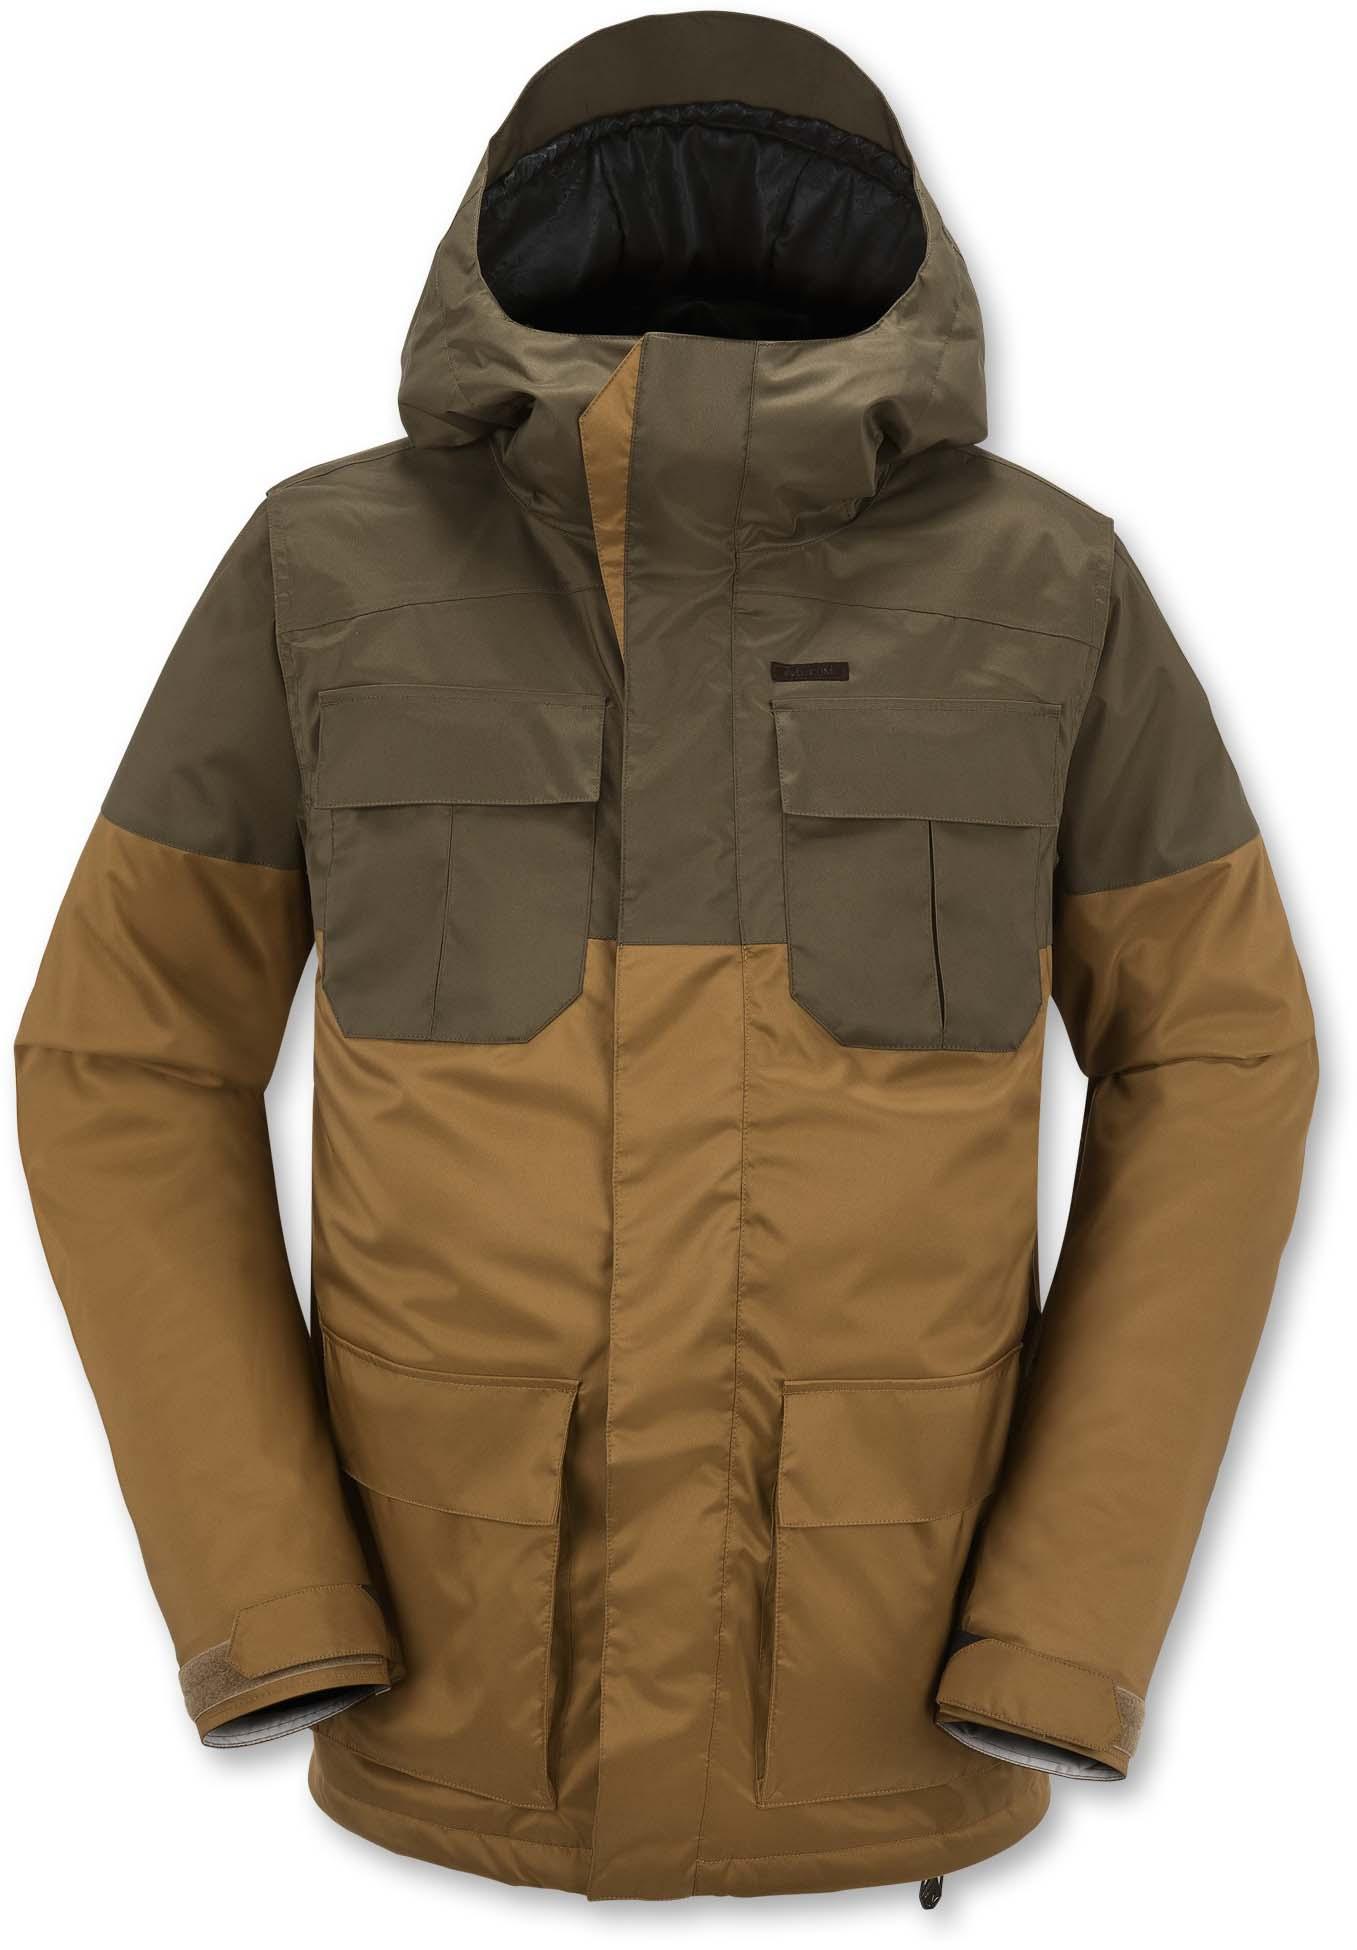 image volcom-alternate-insulated-jacket-caramel-jpg